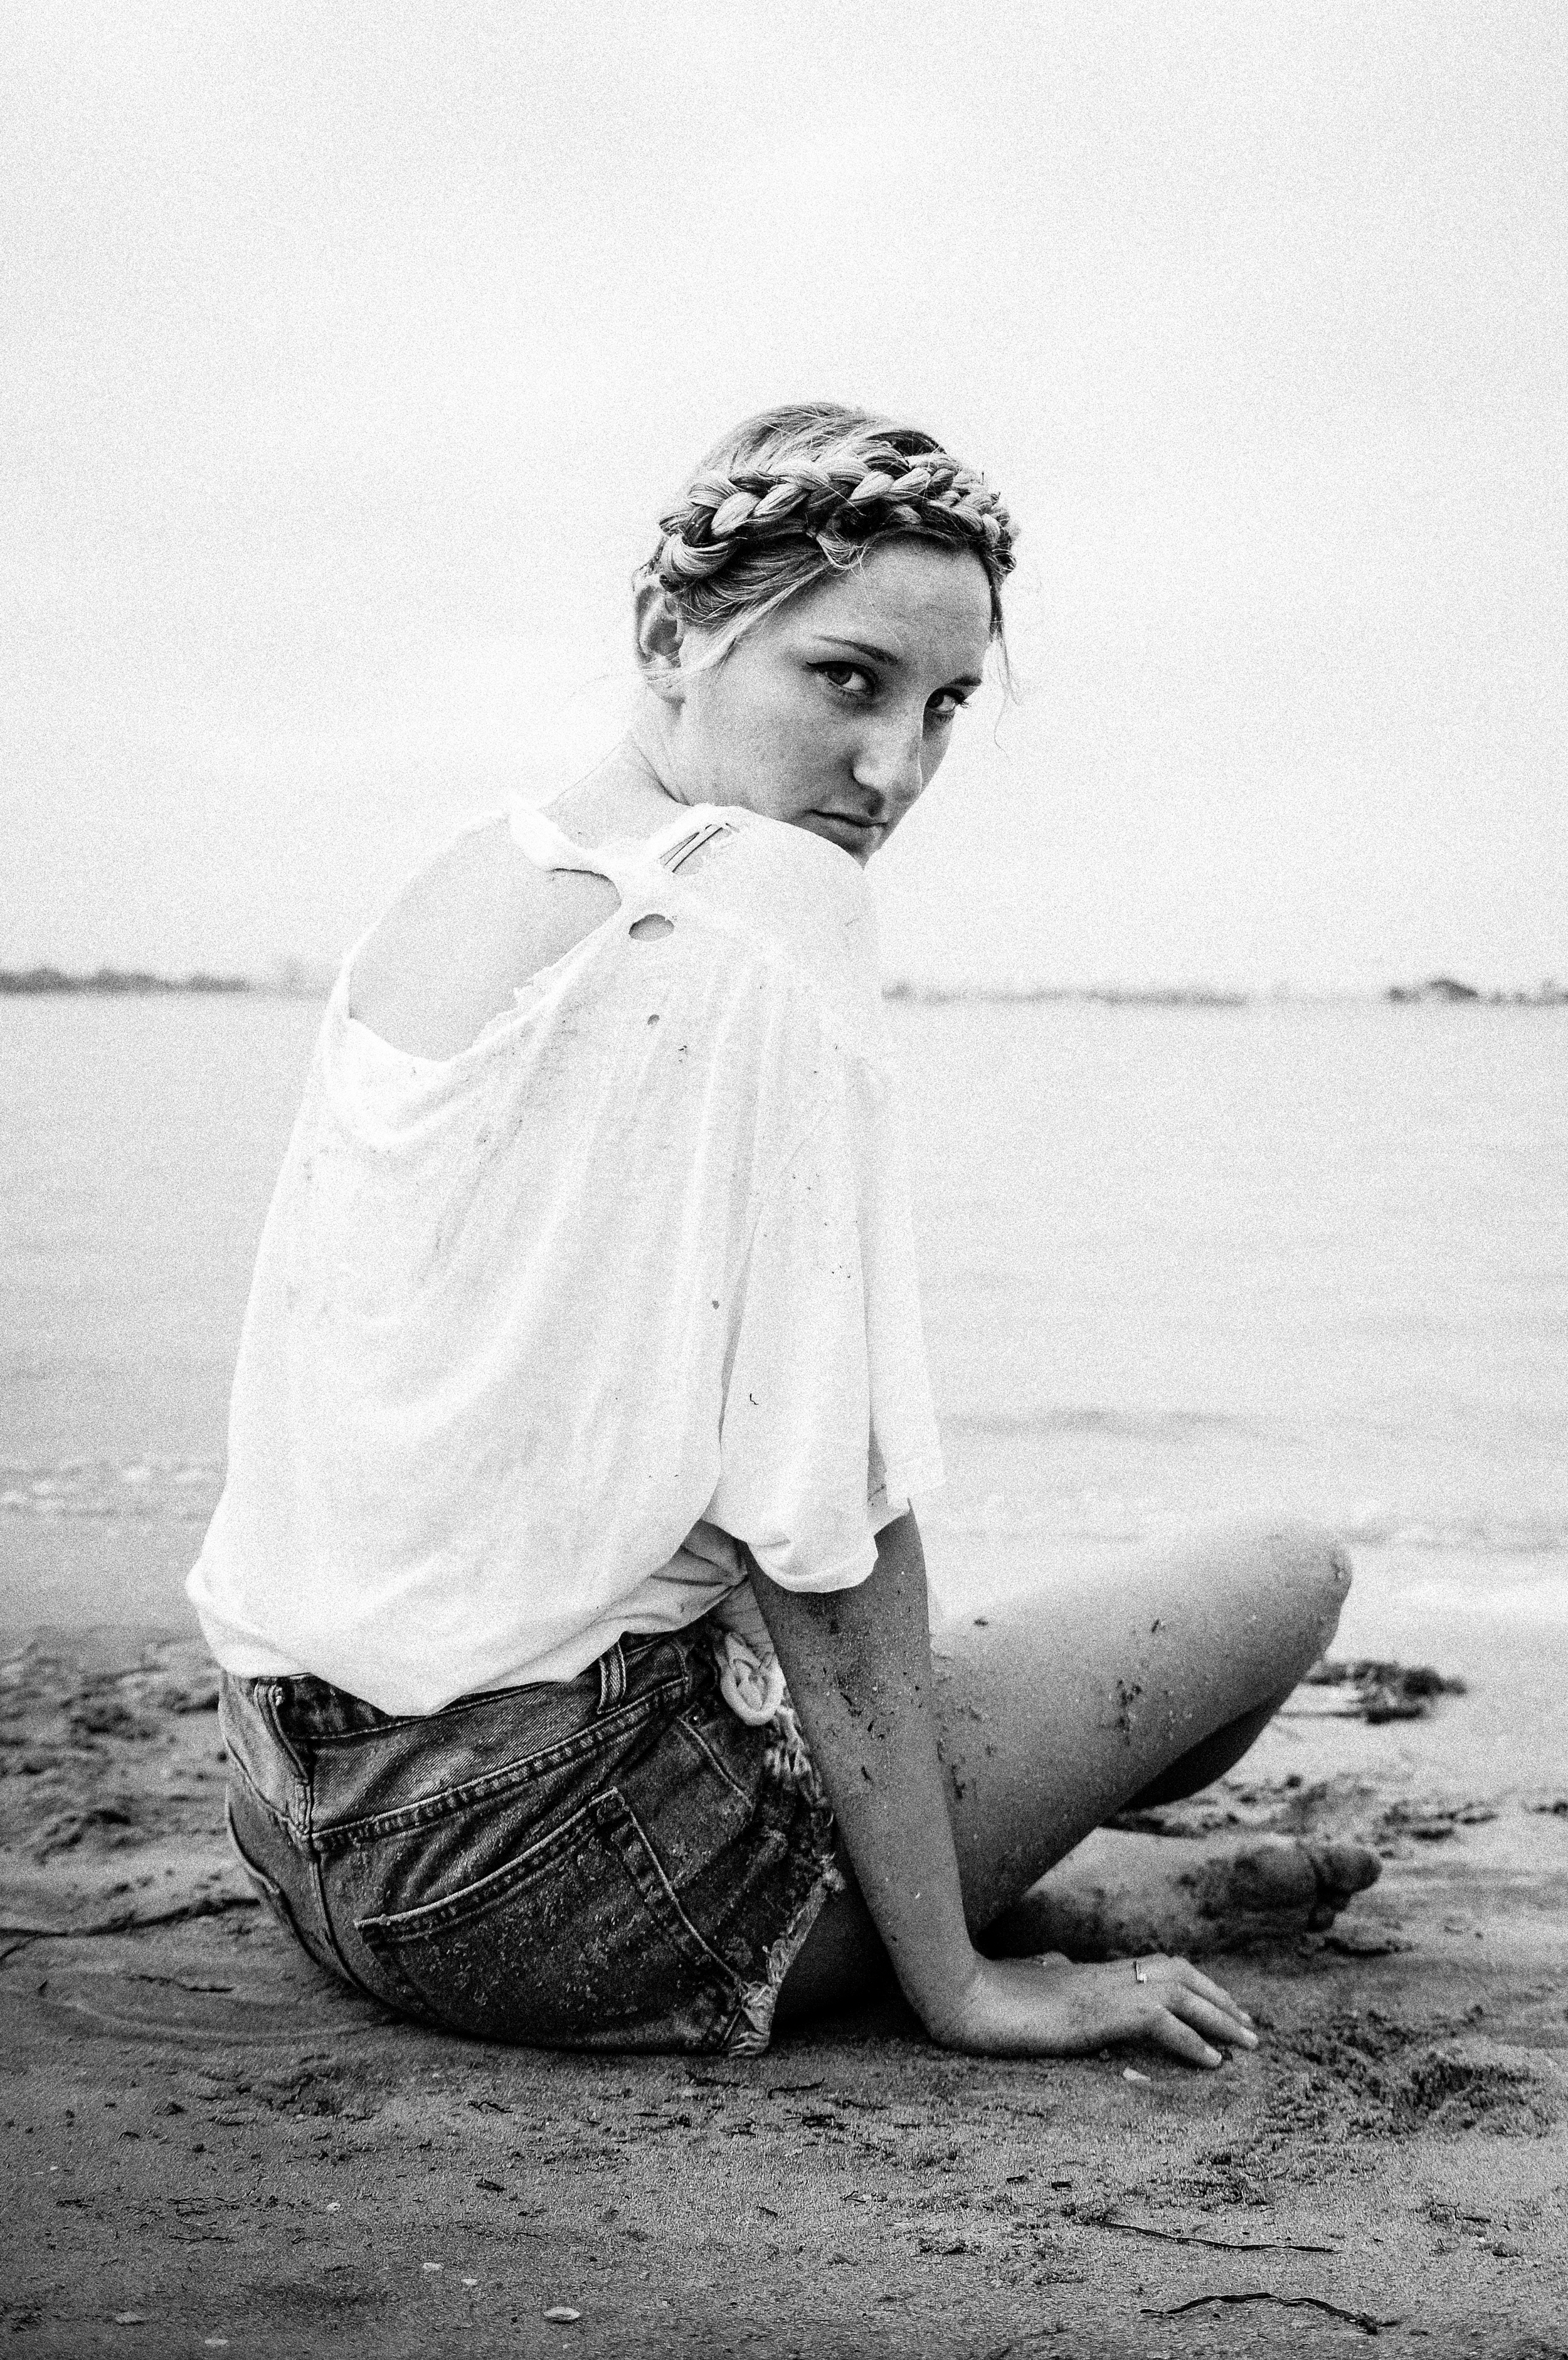 awakening mother earth, ashley marie myers, black and white portrait